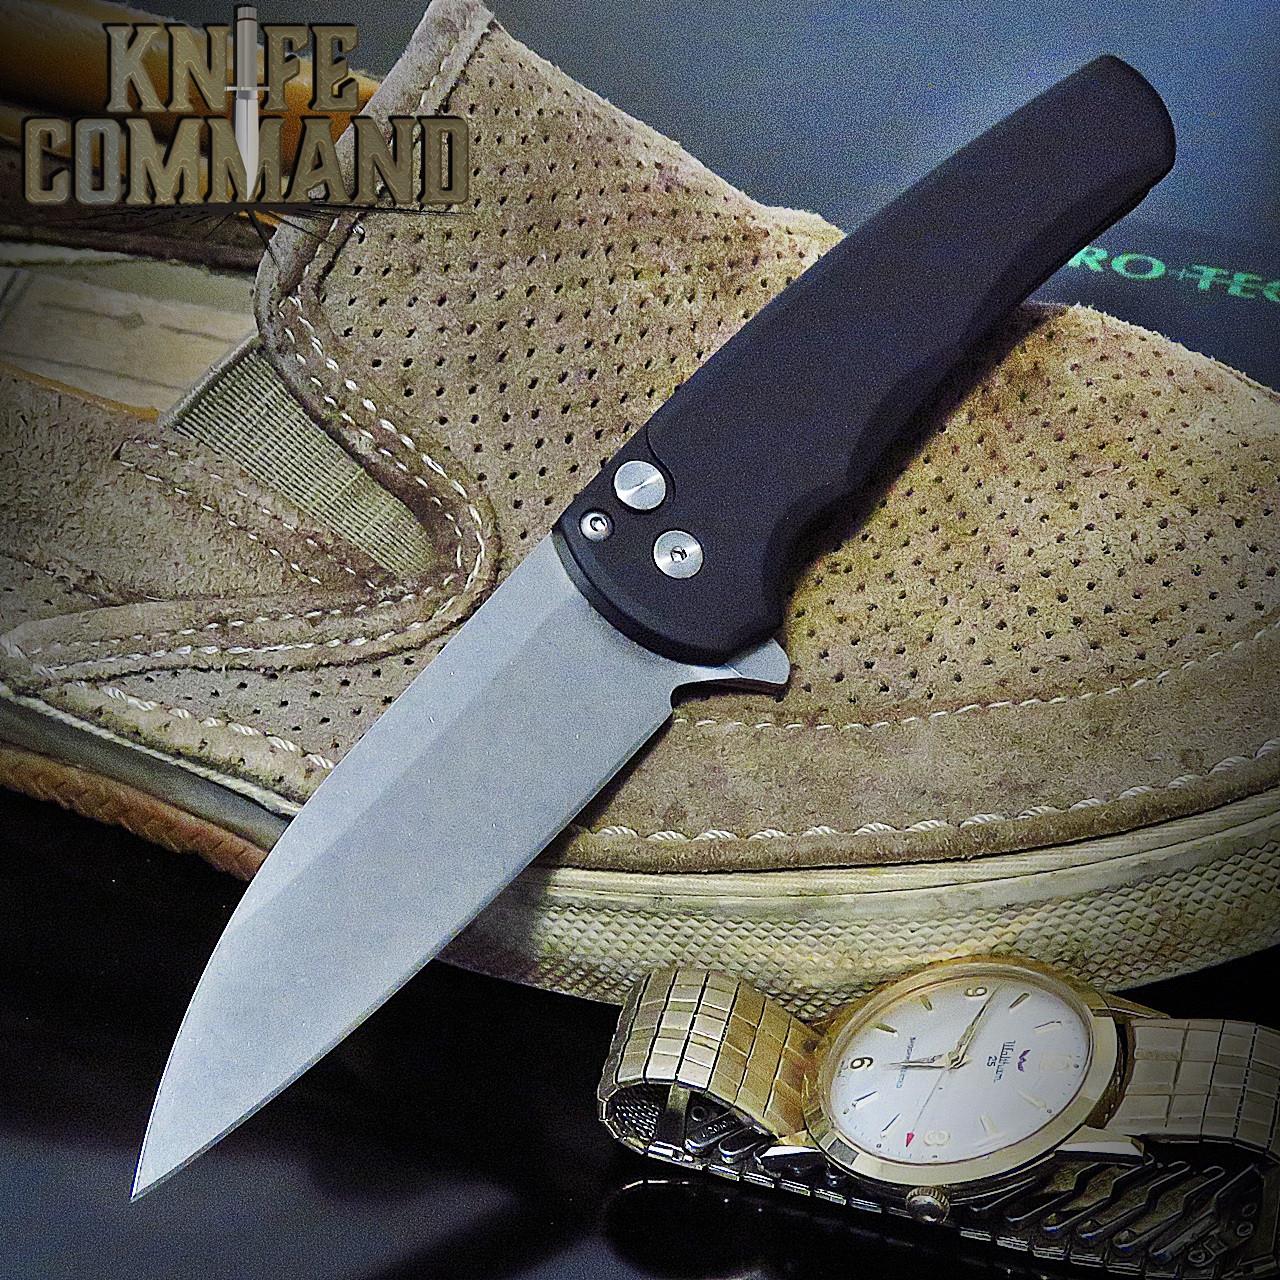 "Pro-Tech Knives 5101 Malibu Manual Flipper Knife Folder 3.25"" Stonewash CPM-20CV Wharncliffe Blade"